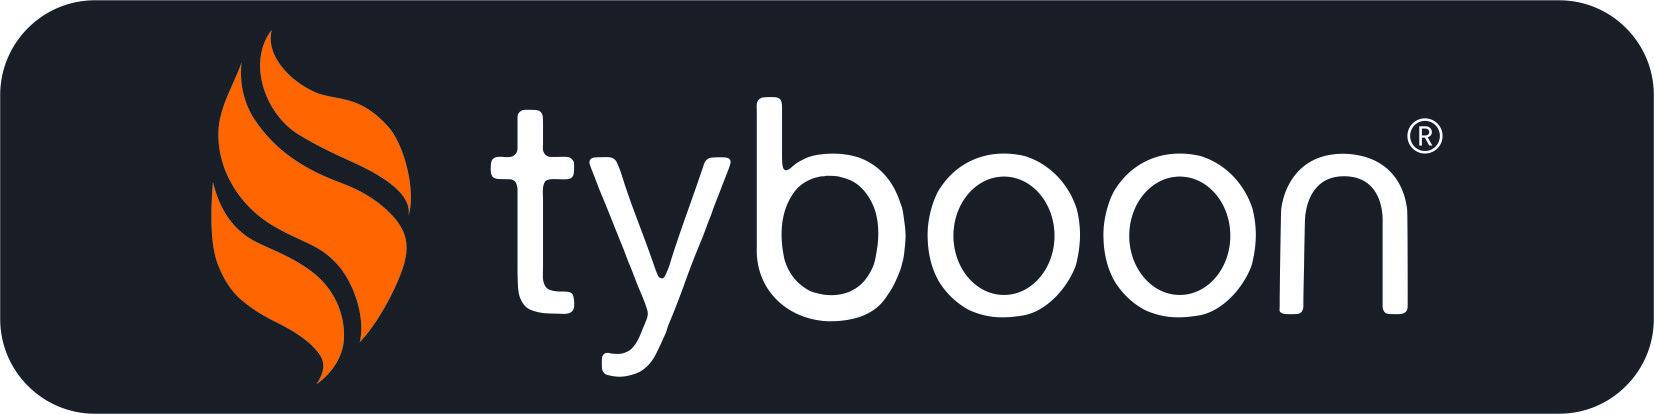 A025021_tyboon.jpg